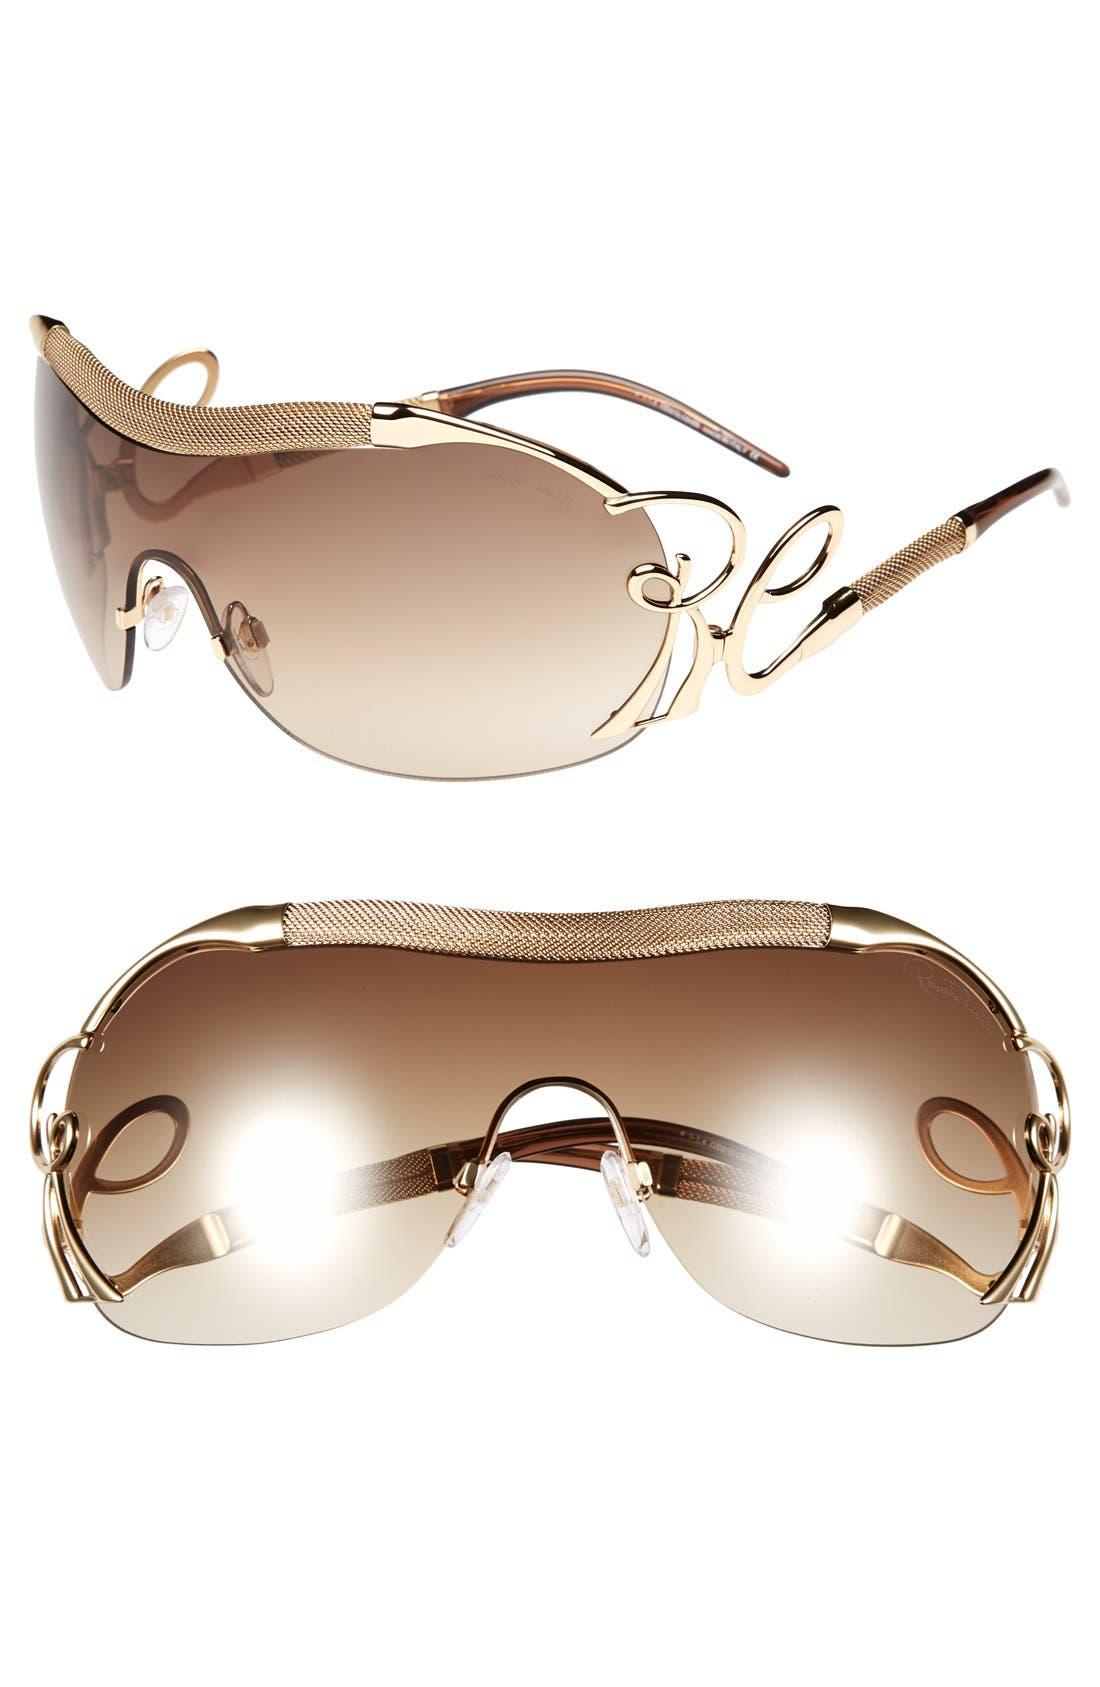 Main Image - Roberto Cavalli 'Botein' Shield Sunglasses